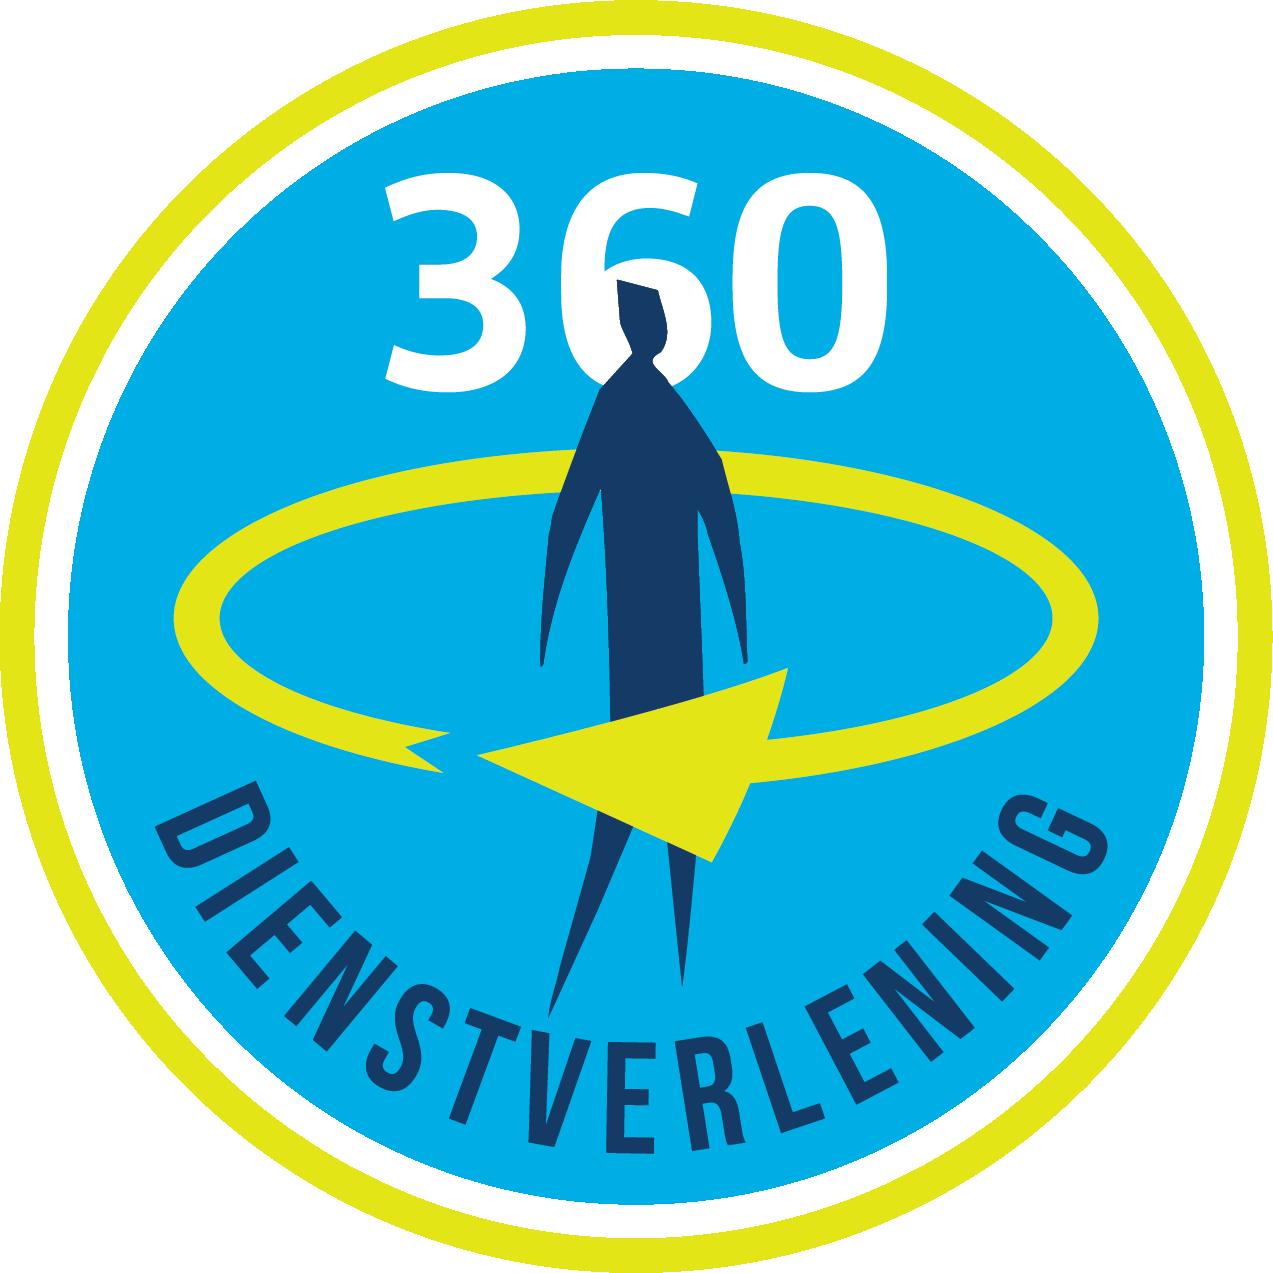 aclvb-universele_diensten-logo-cmyk_ok-2_5.png